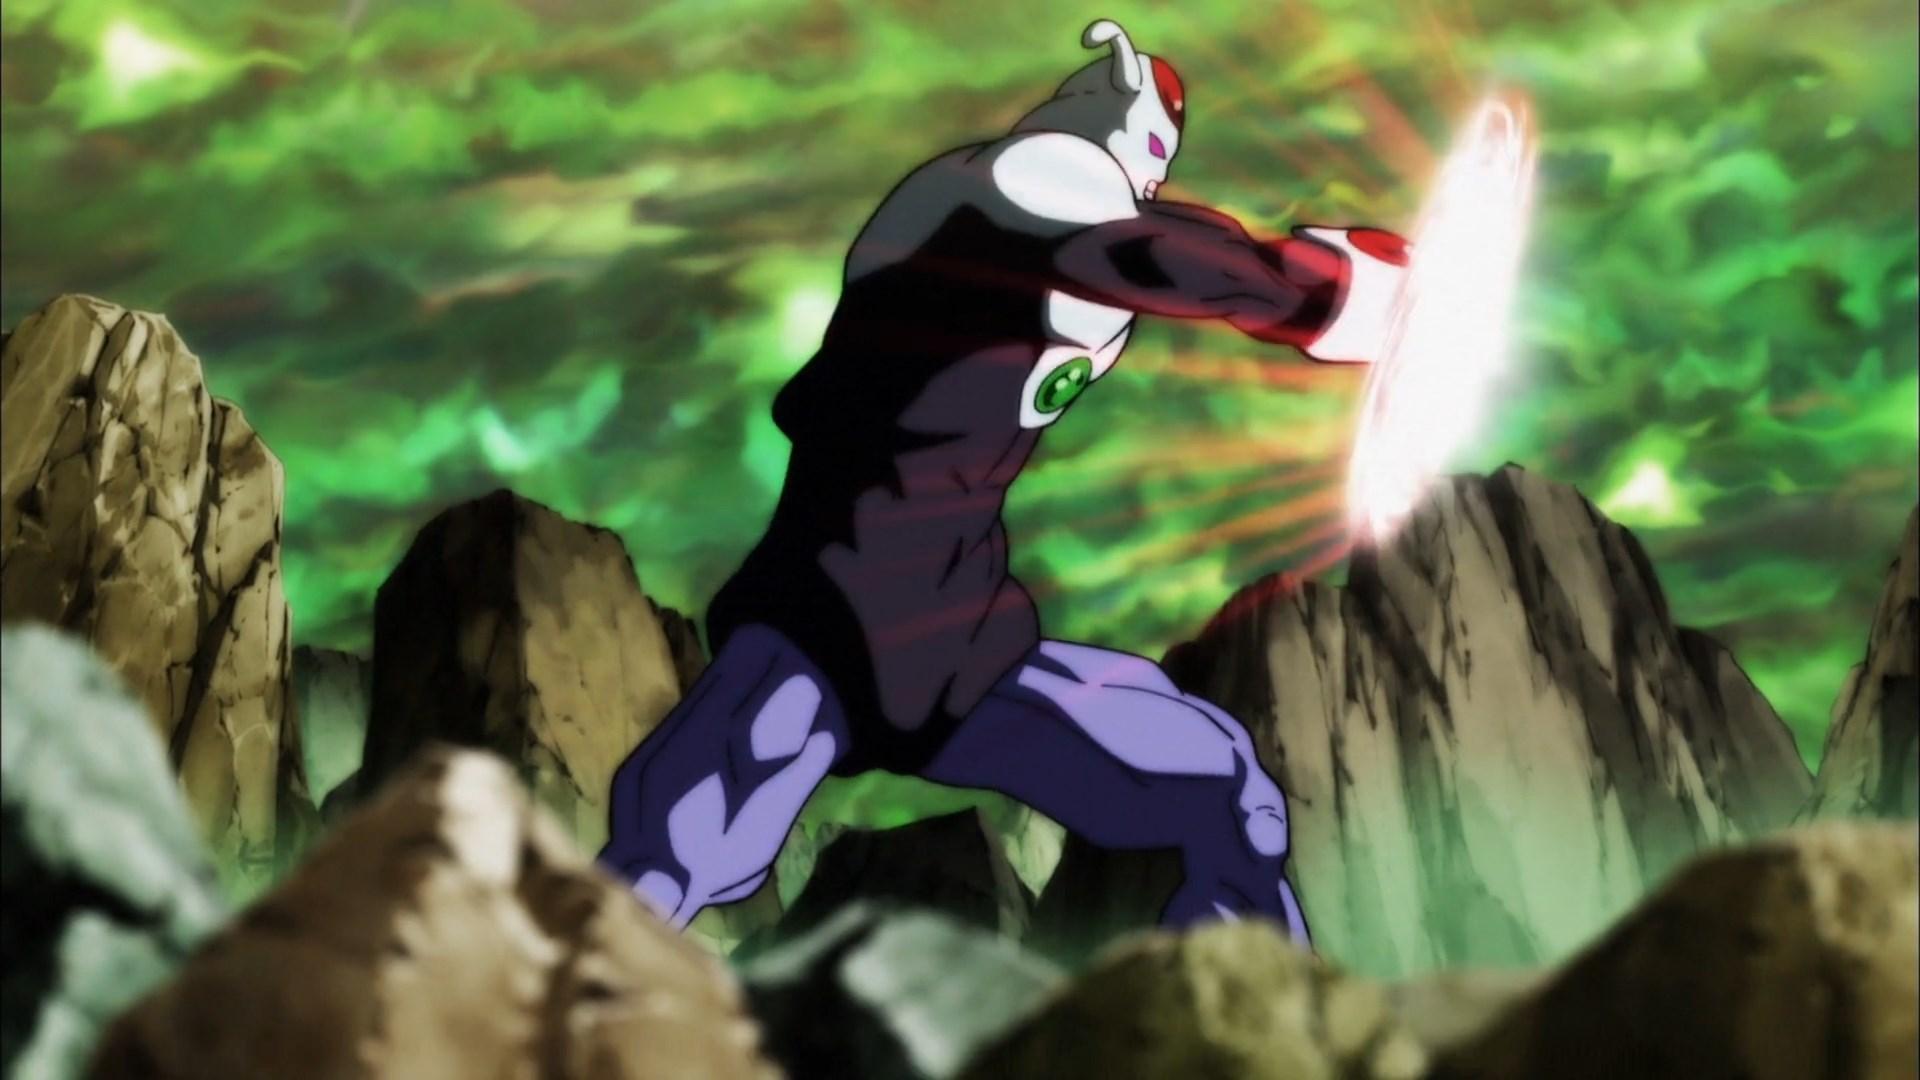 [HorribleSubs] Dragon Ball Super - 121 [1080p].mkv_snapshot_11.17